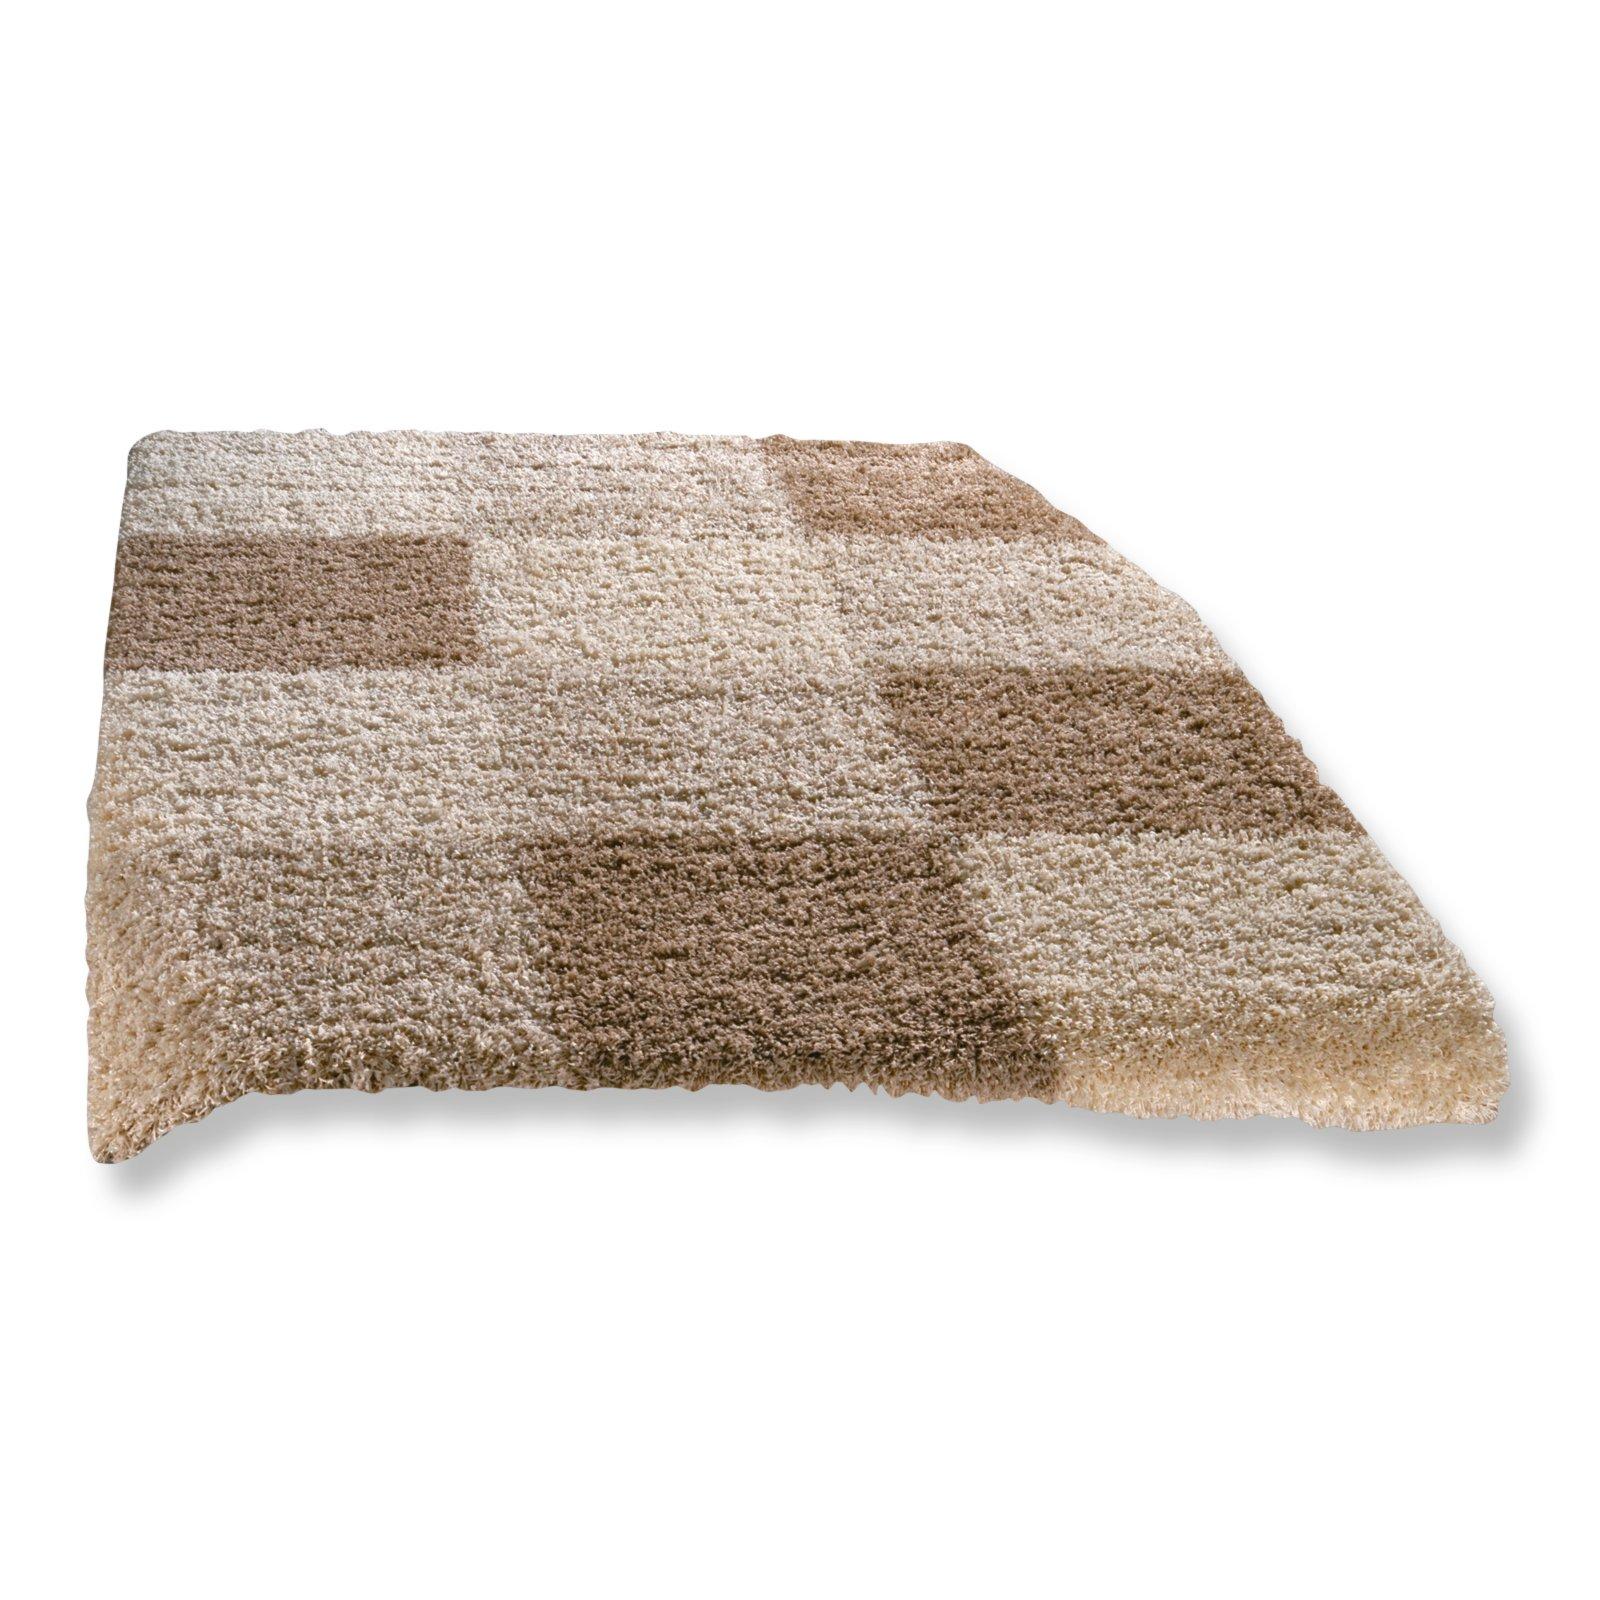 teppich shaggy creme 160x230 cm hochflor shaggyteppiche teppiche l ufer deko. Black Bedroom Furniture Sets. Home Design Ideas